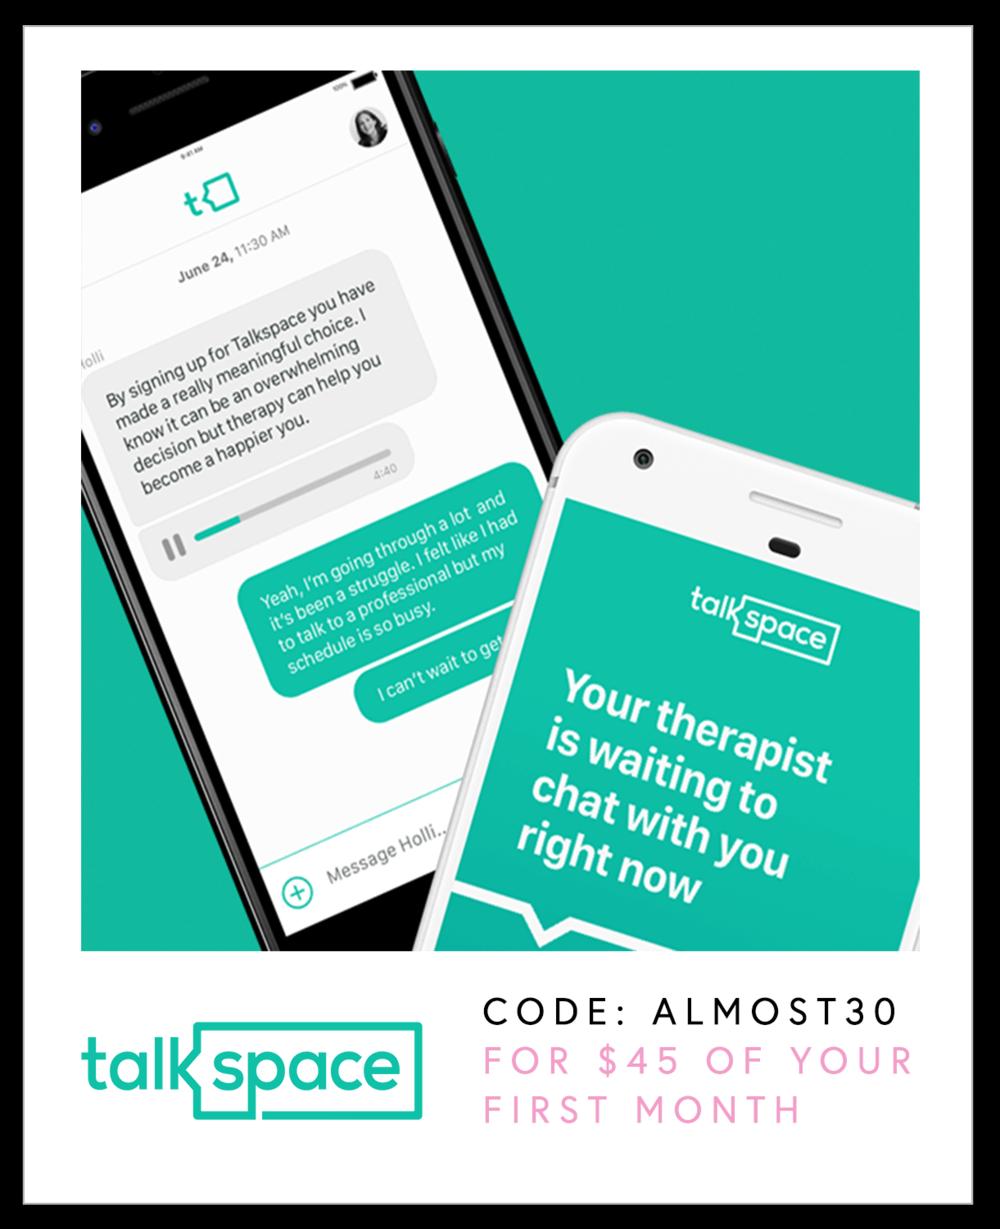 talkspace.png